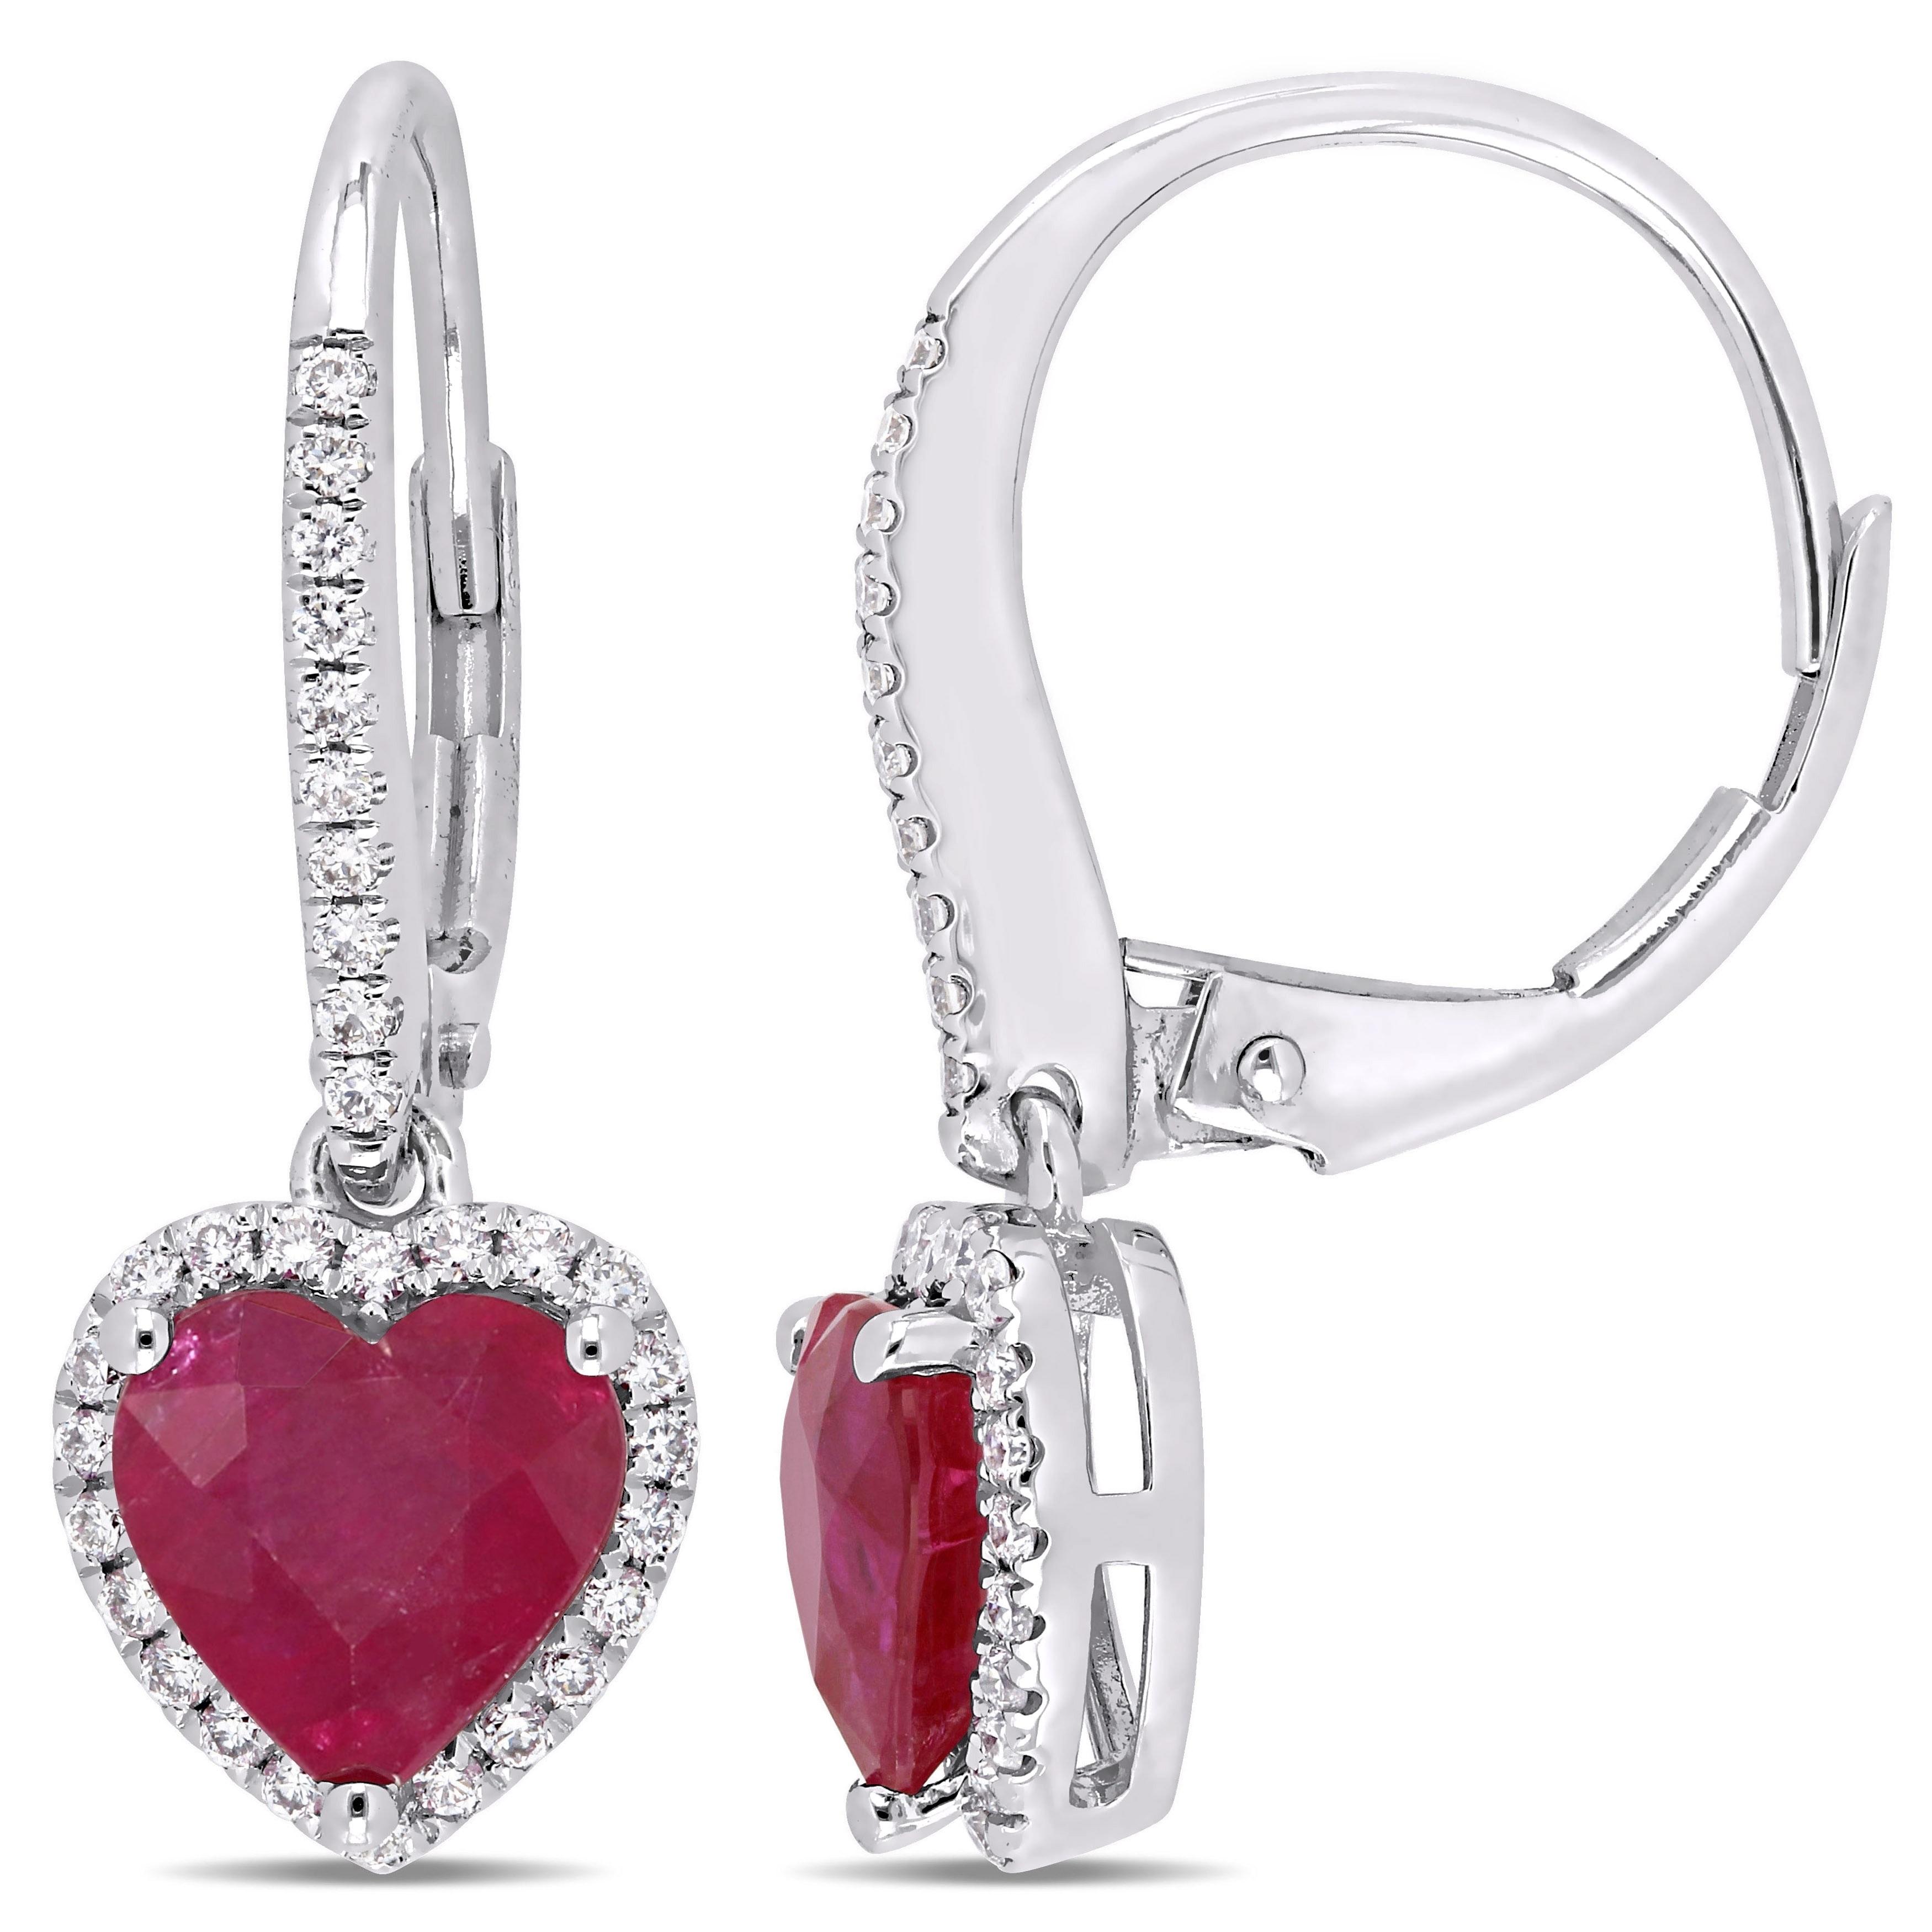 1 Ct Created Diamond Halo Ruby Heart Dangle Leverback Earrings 14K White Gold